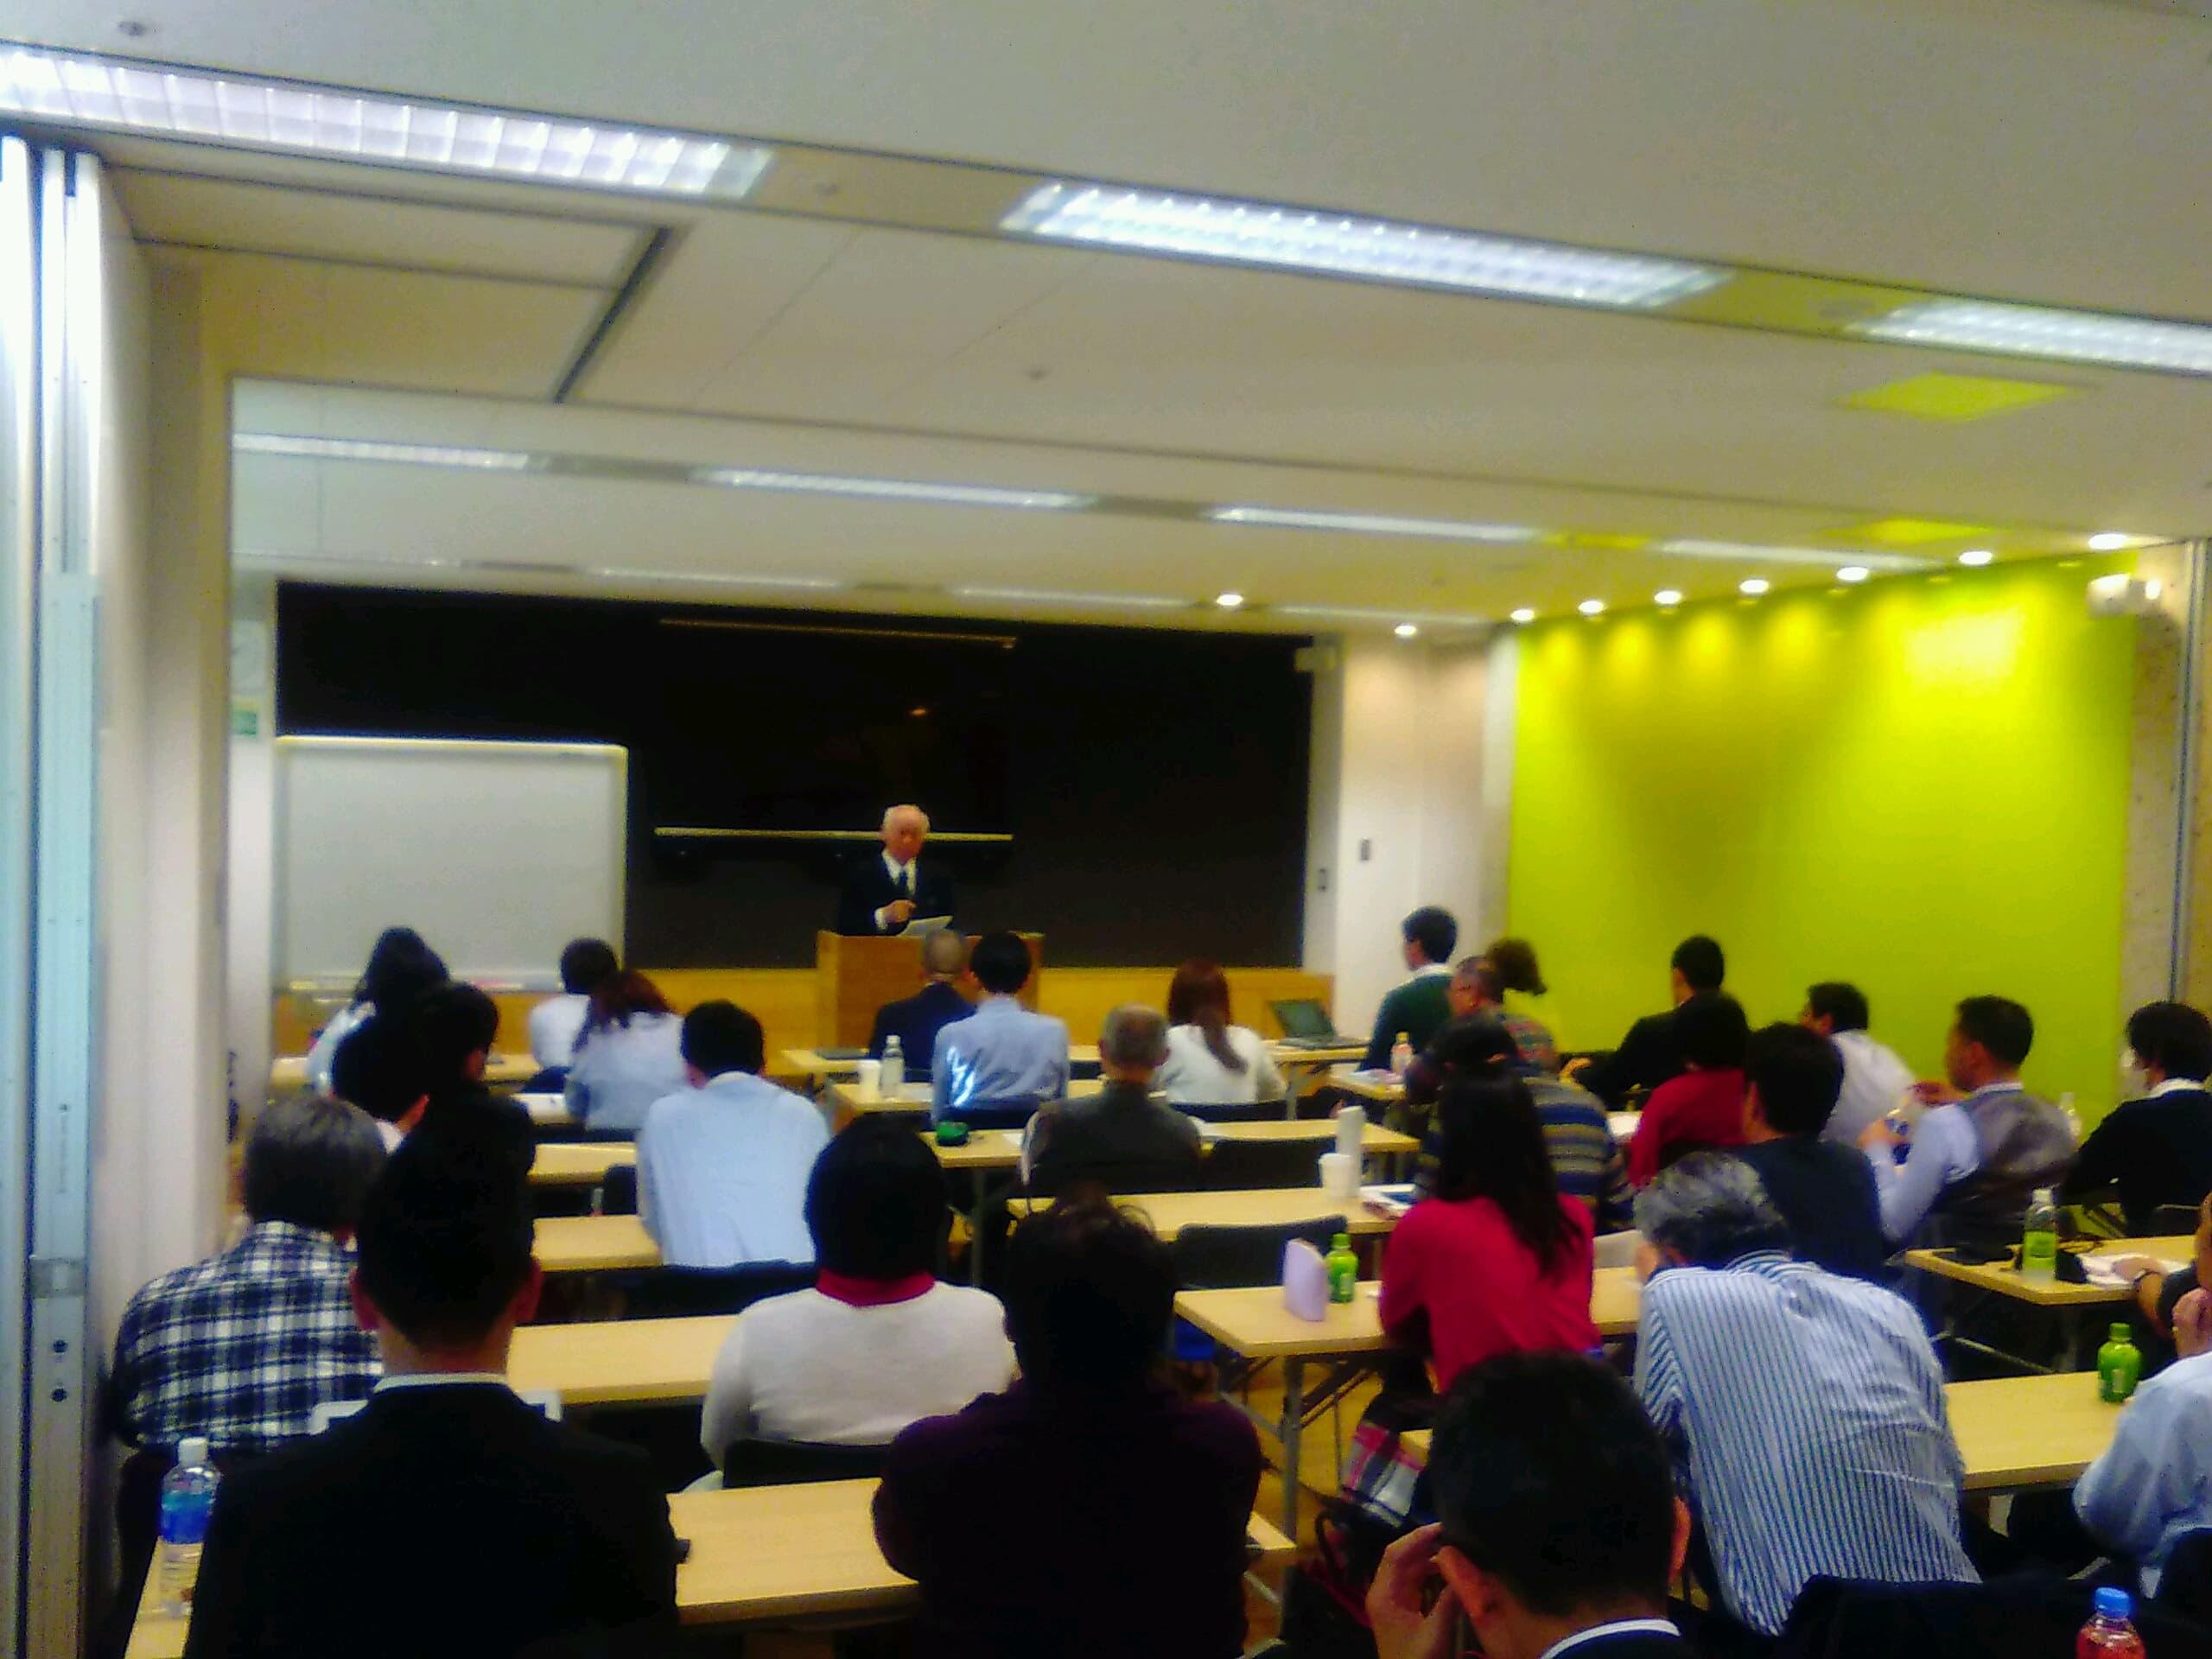 47393127 275446516362729 8016478714780975104 n - 2018年12月1日(土)第6回東京思風塾開催しました。